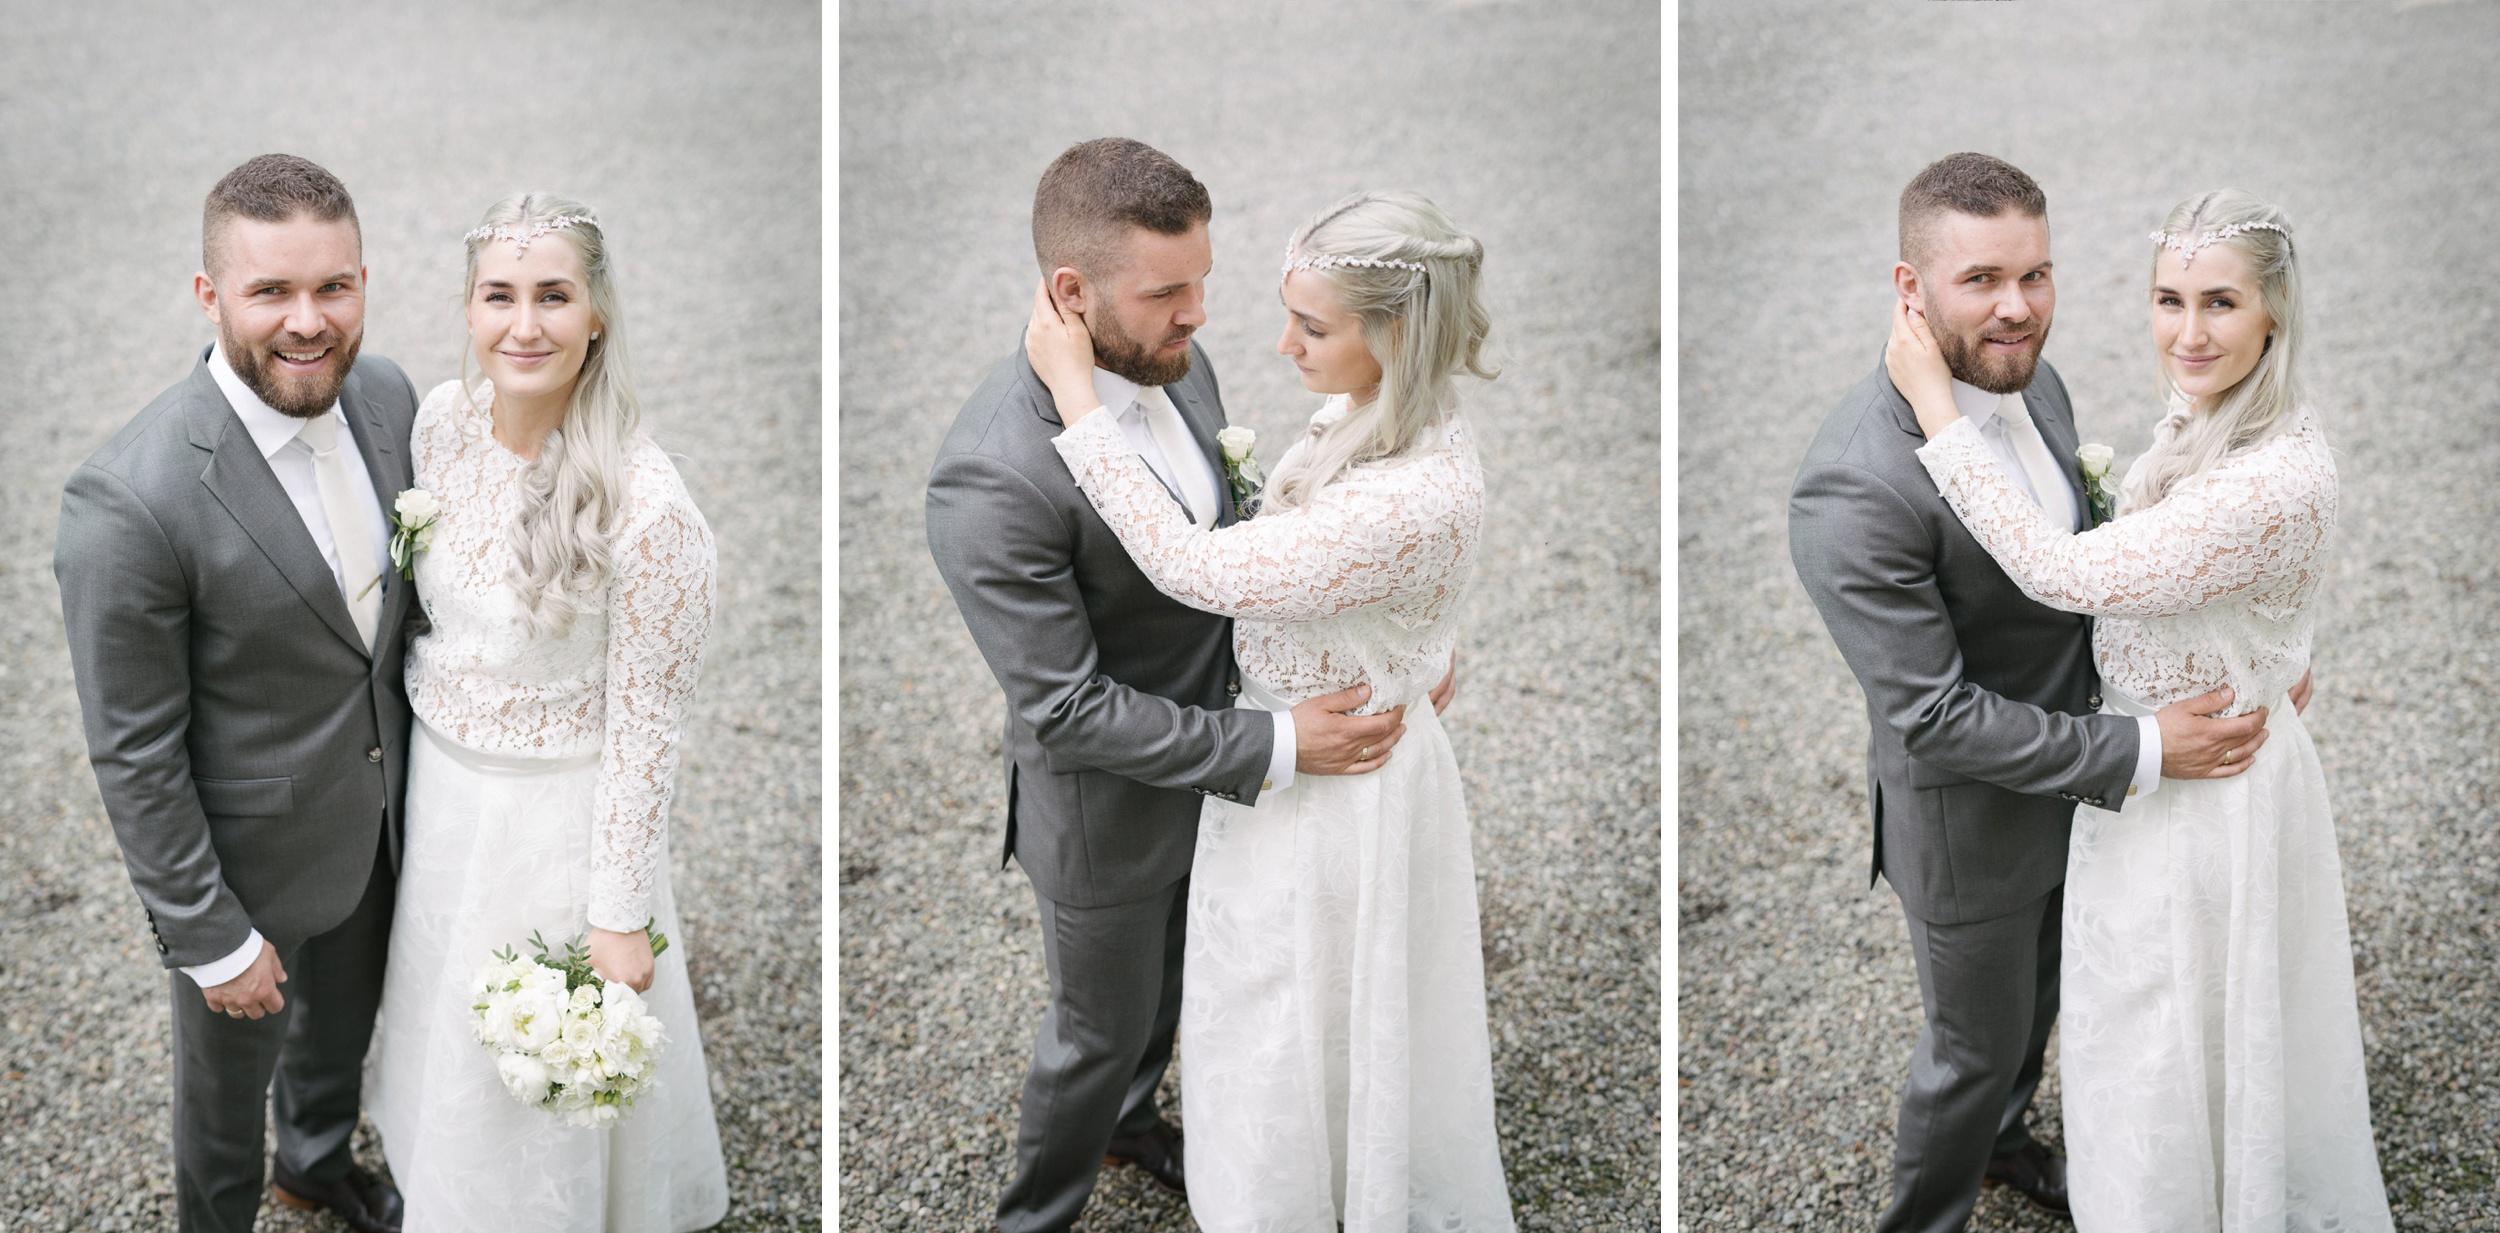 bryllup-bryllupsfotografering-bryllupsfotograf-sarpsborg-20170520-_H2A1144Camilla-og-ruben_WEB.jpg